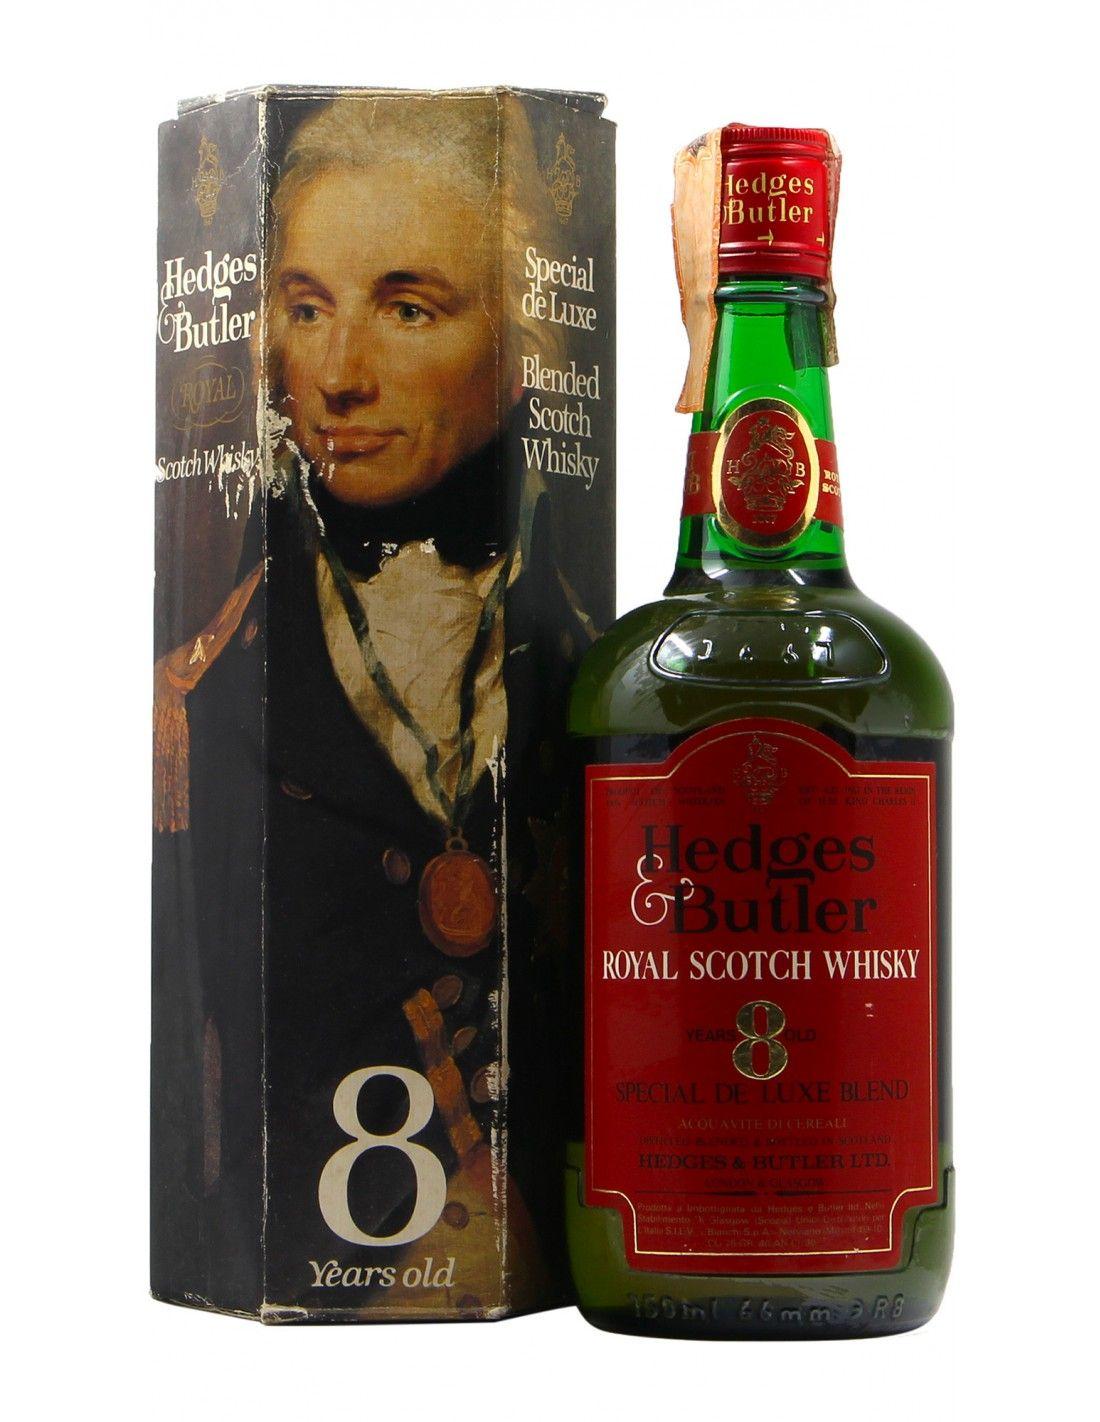 WHISKY 8YO SPECIAL DE LUXE BLEND 75CL 40° NV HEDGES BUTLER Grandi Bottiglie